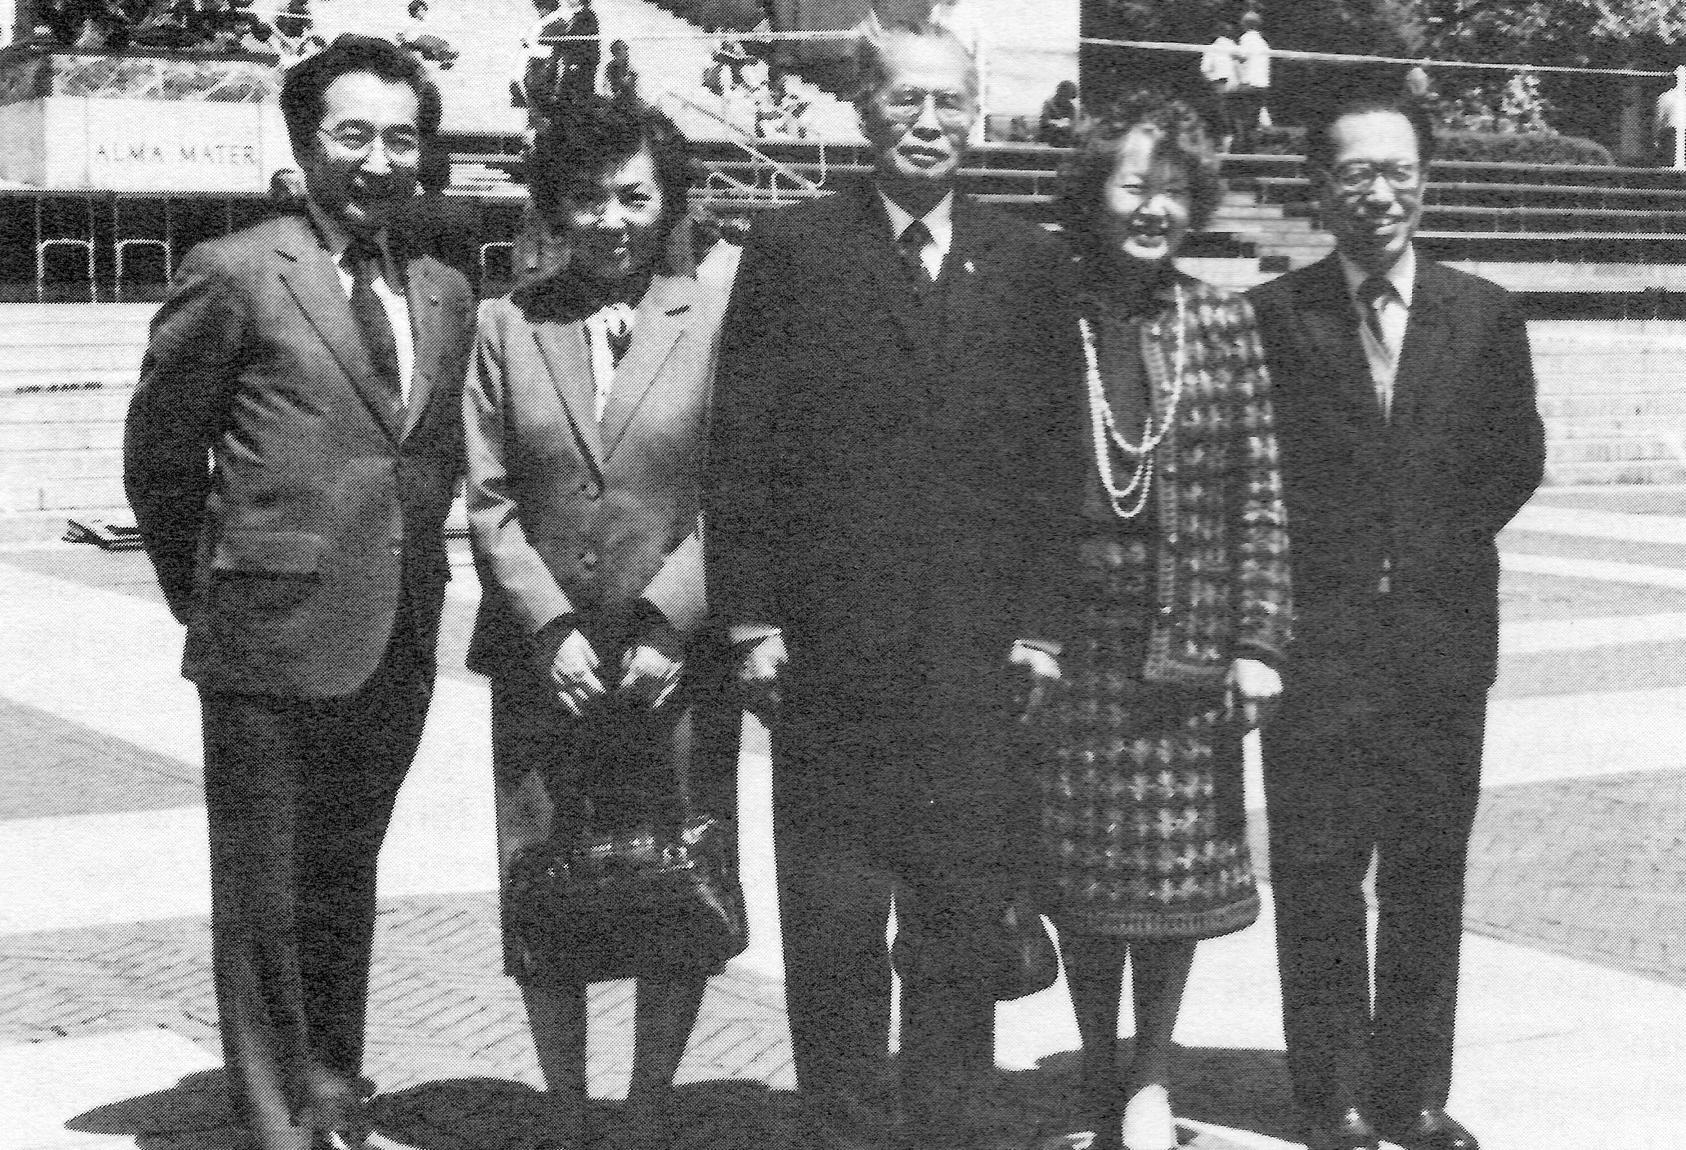 CICEC delegation on the Columbia University campus (left to right): Chou Wen-chung, Shi Hong, Cheng Siyuan (delegation leader), Yi-an Chou, and Wang Zhizi